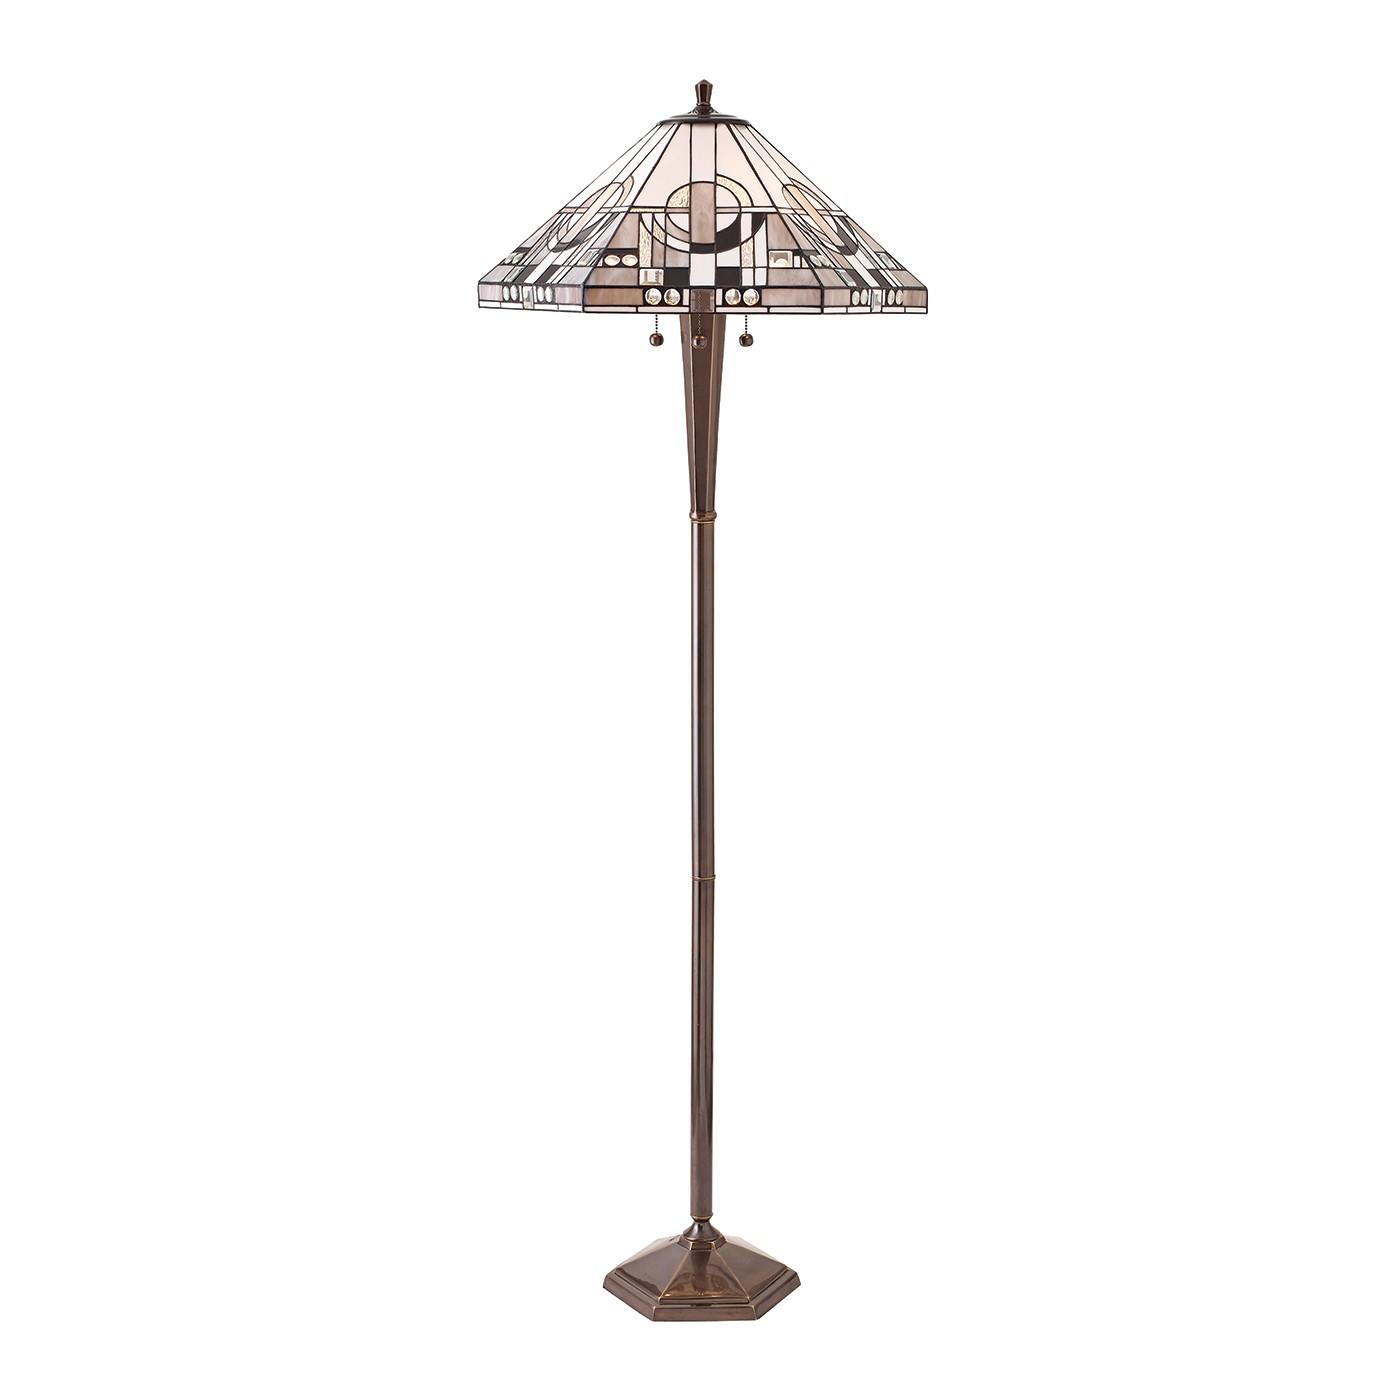 70662 tiffany down 3 light floor lamp lighting bug swindon. Black Bedroom Furniture Sets. Home Design Ideas